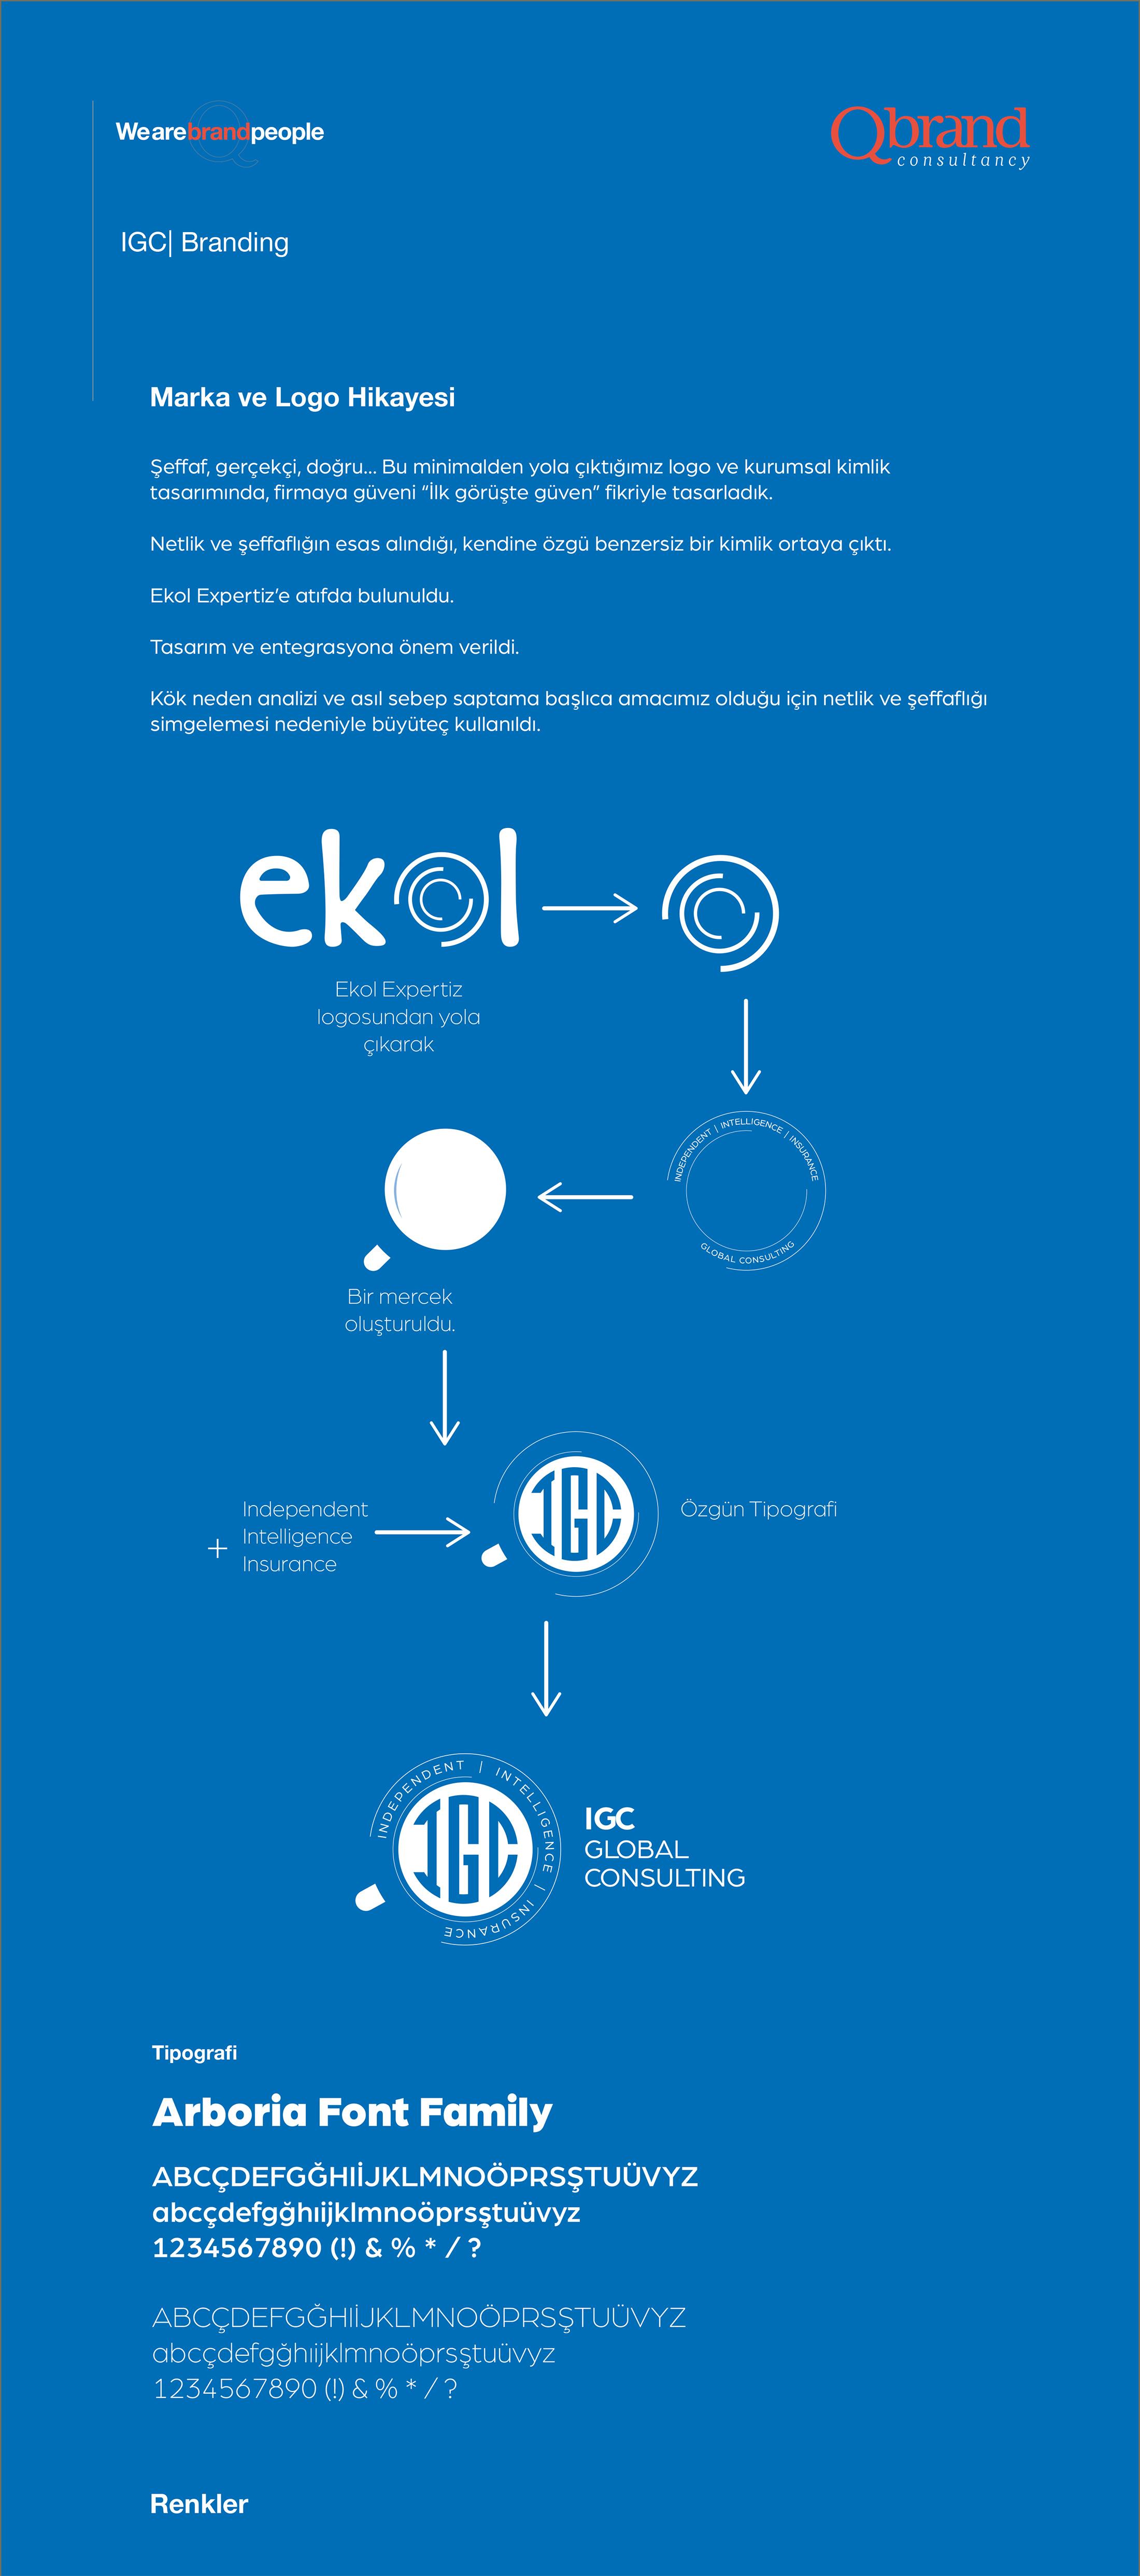 Ankara kurumsal kimlik tasarımı  IGC Global Consulting